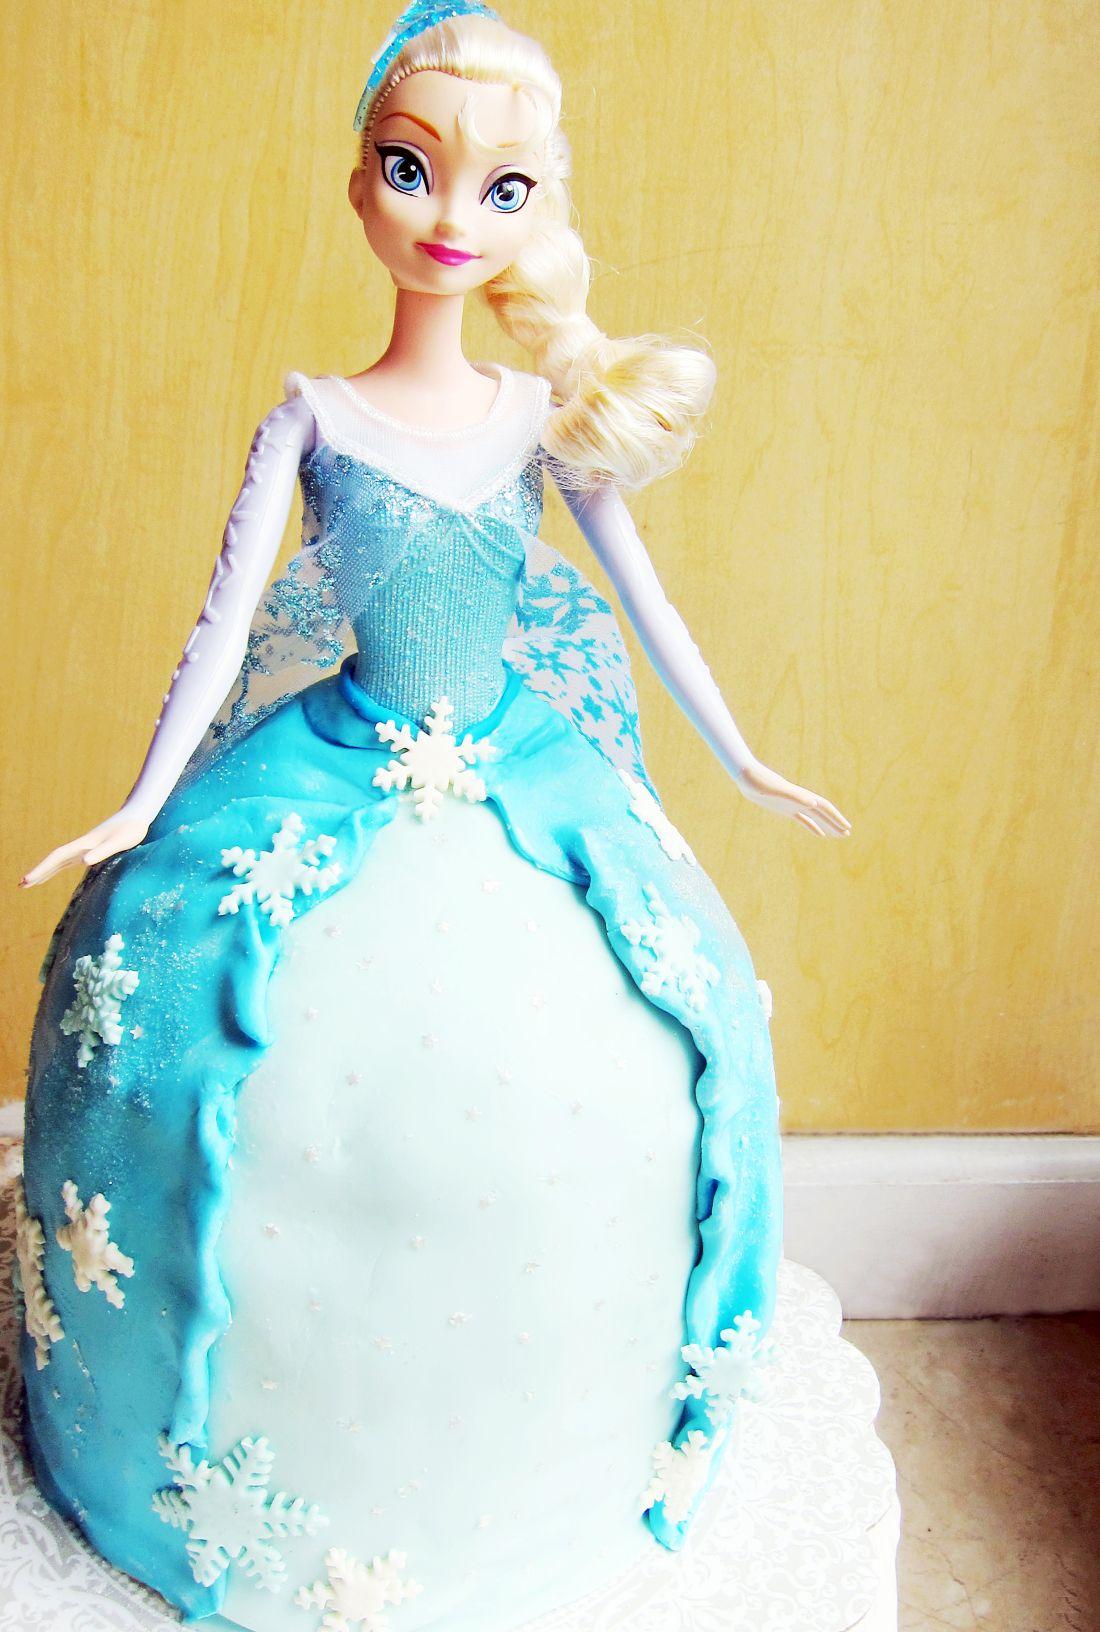 Elsa Doll Cake Elsa doll cake, Elsa doll, Doll cake